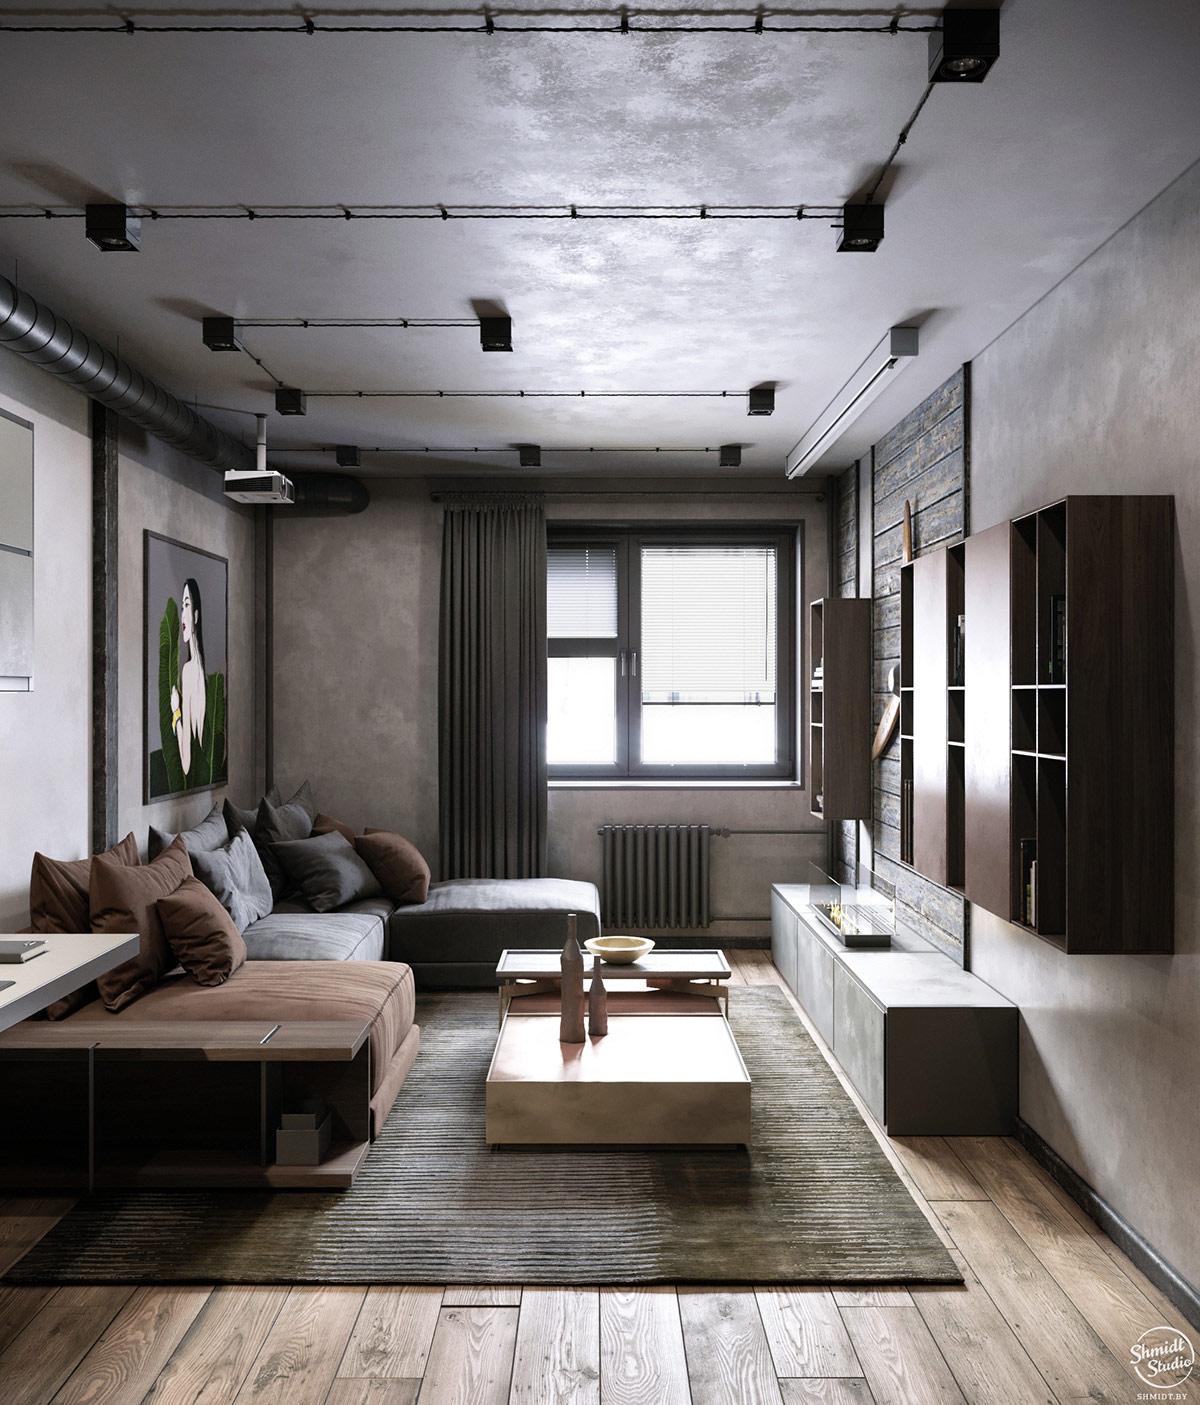 brown-and-grey-sofa